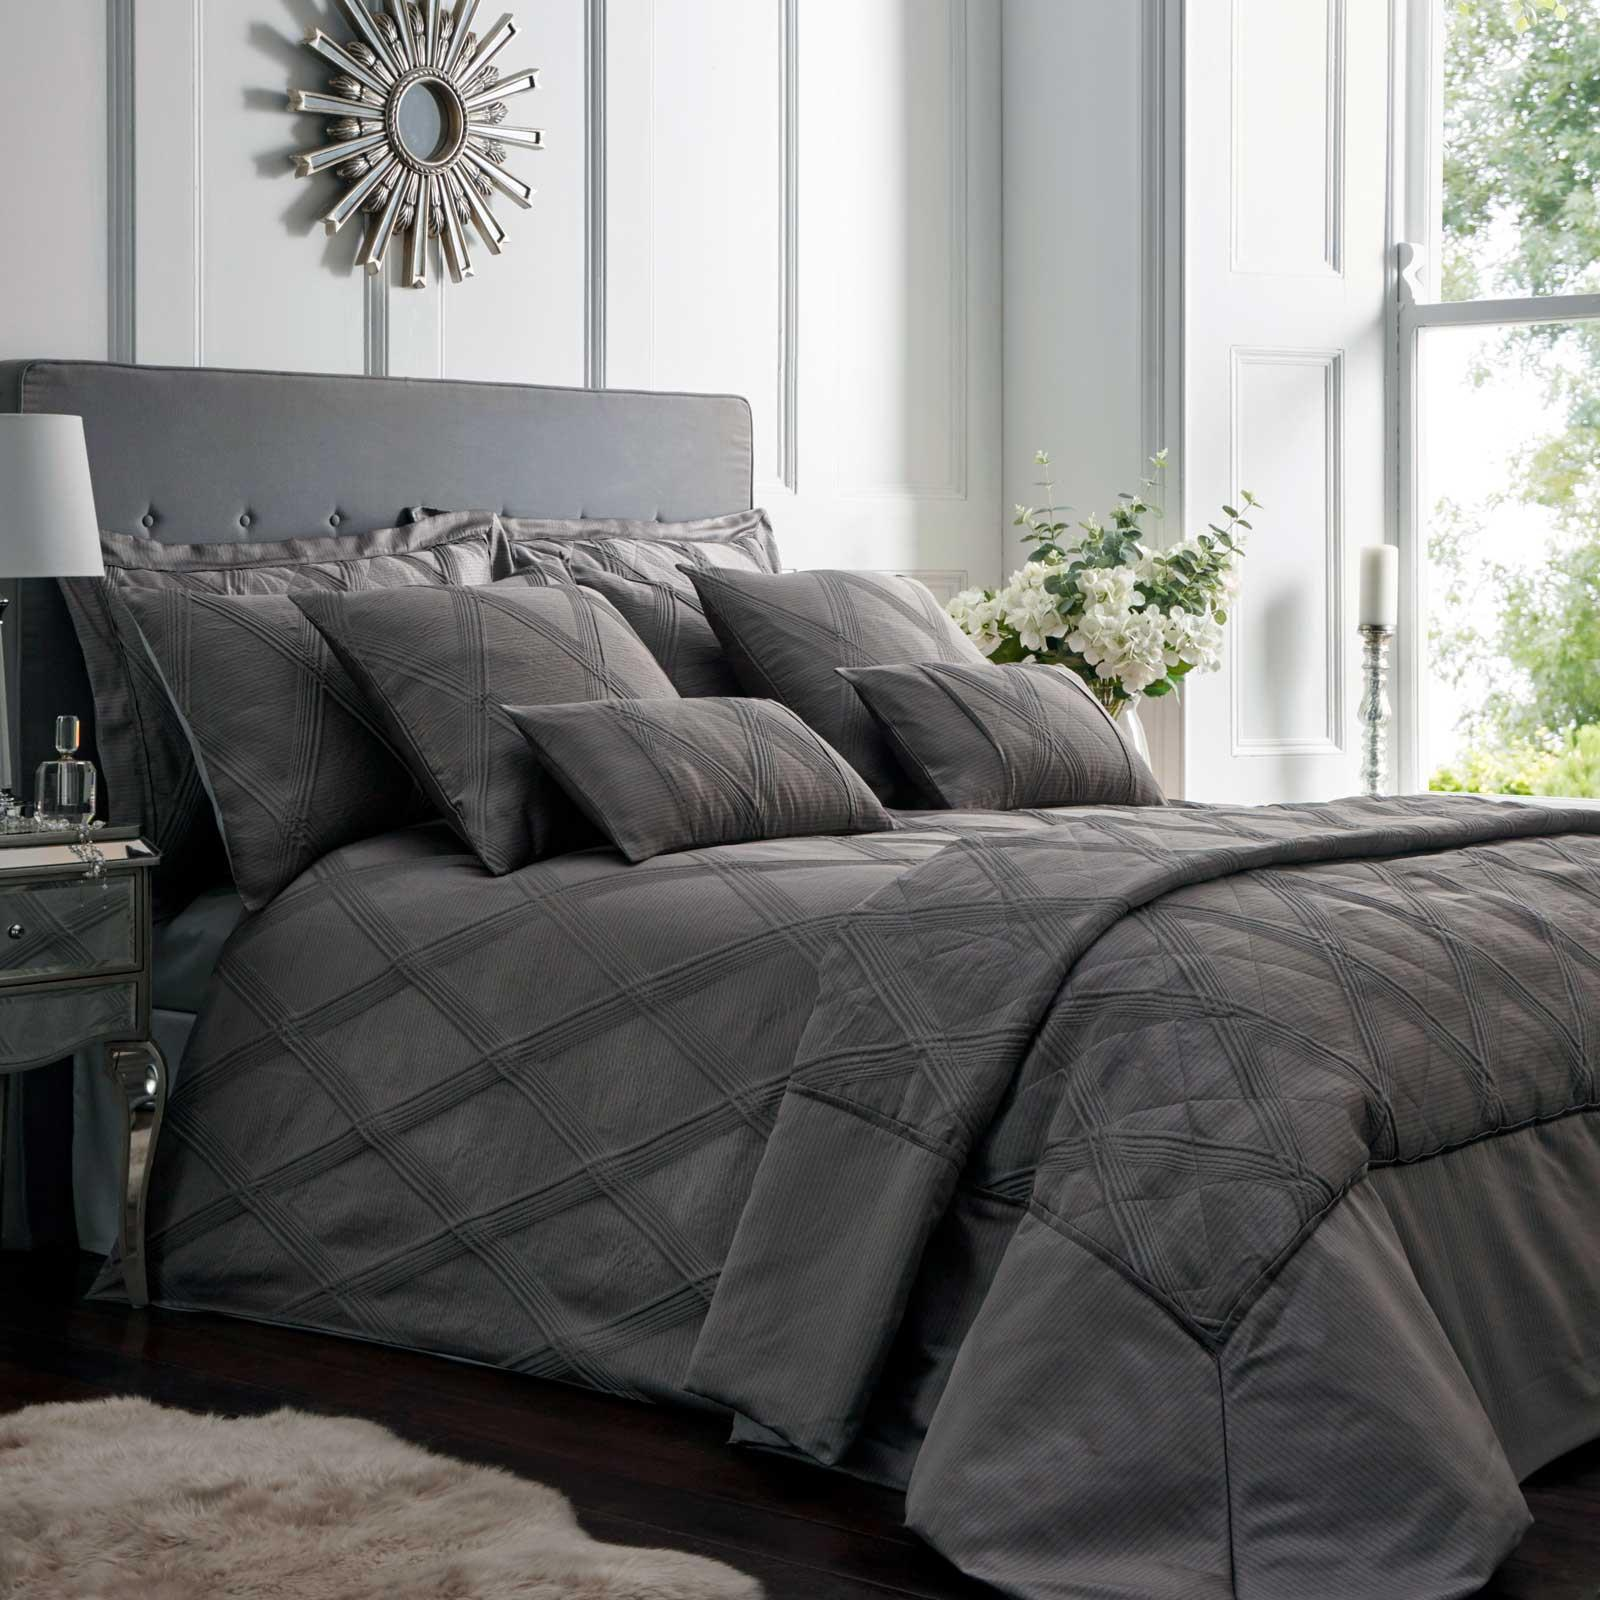 Grey Duvet Covers Textured Diamond Modern Jacquard Quilt Cover Bedding Sets Ebay